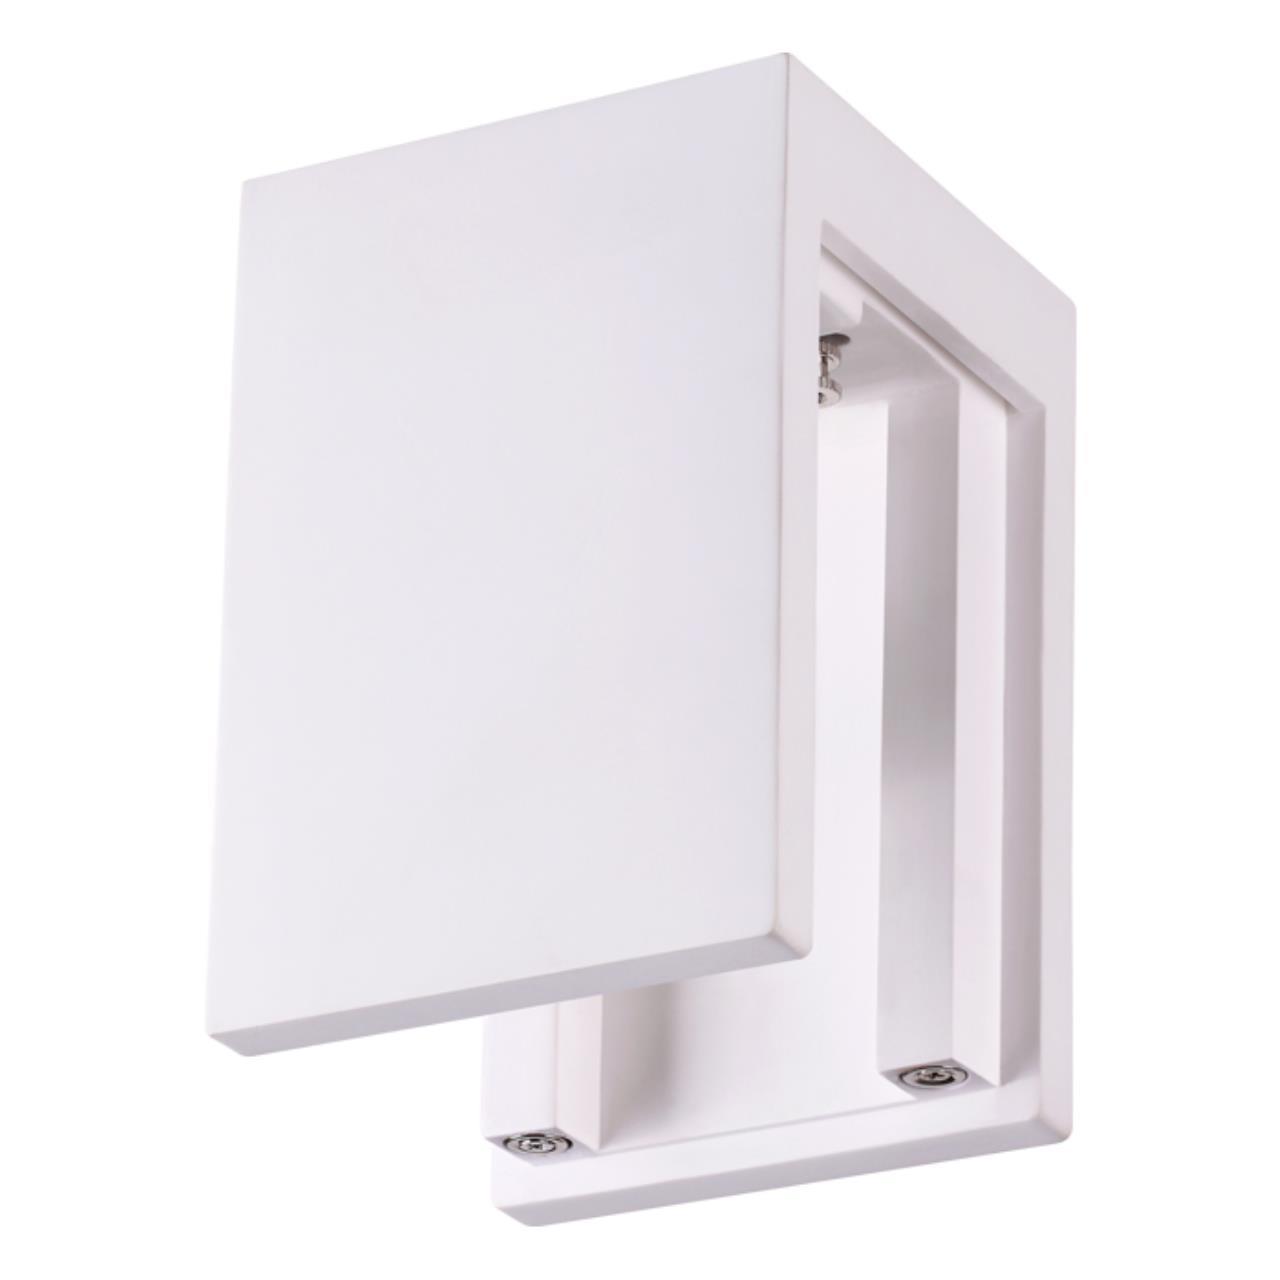 370500 KONST NT19 034 белый Накладной светильник IP20 GU10 50W 220-240V LEGIO